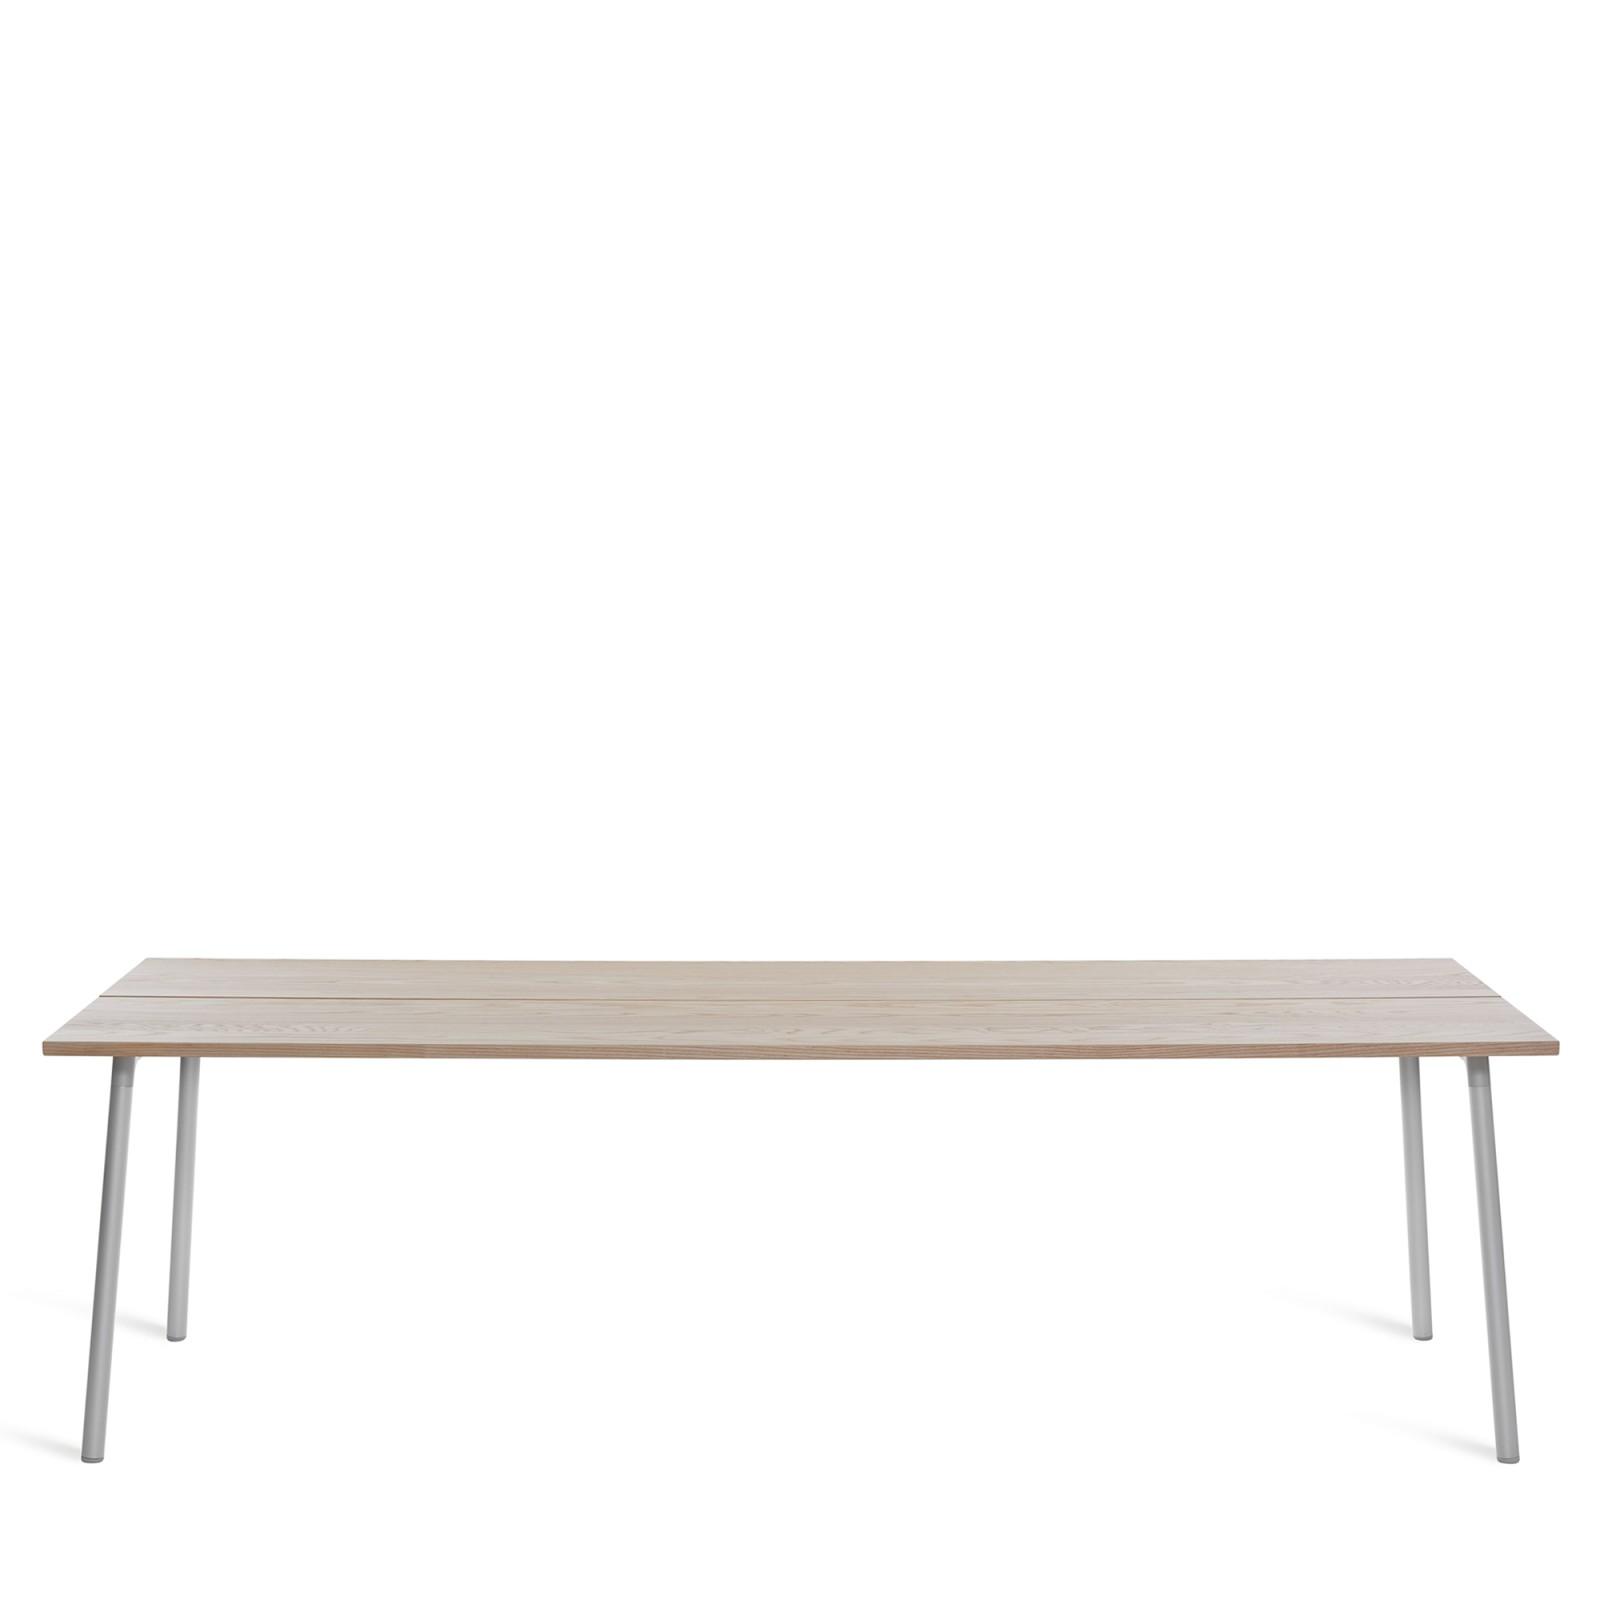 Run Dining Table Rectangular 244cm, Clear Aluminium, Ash